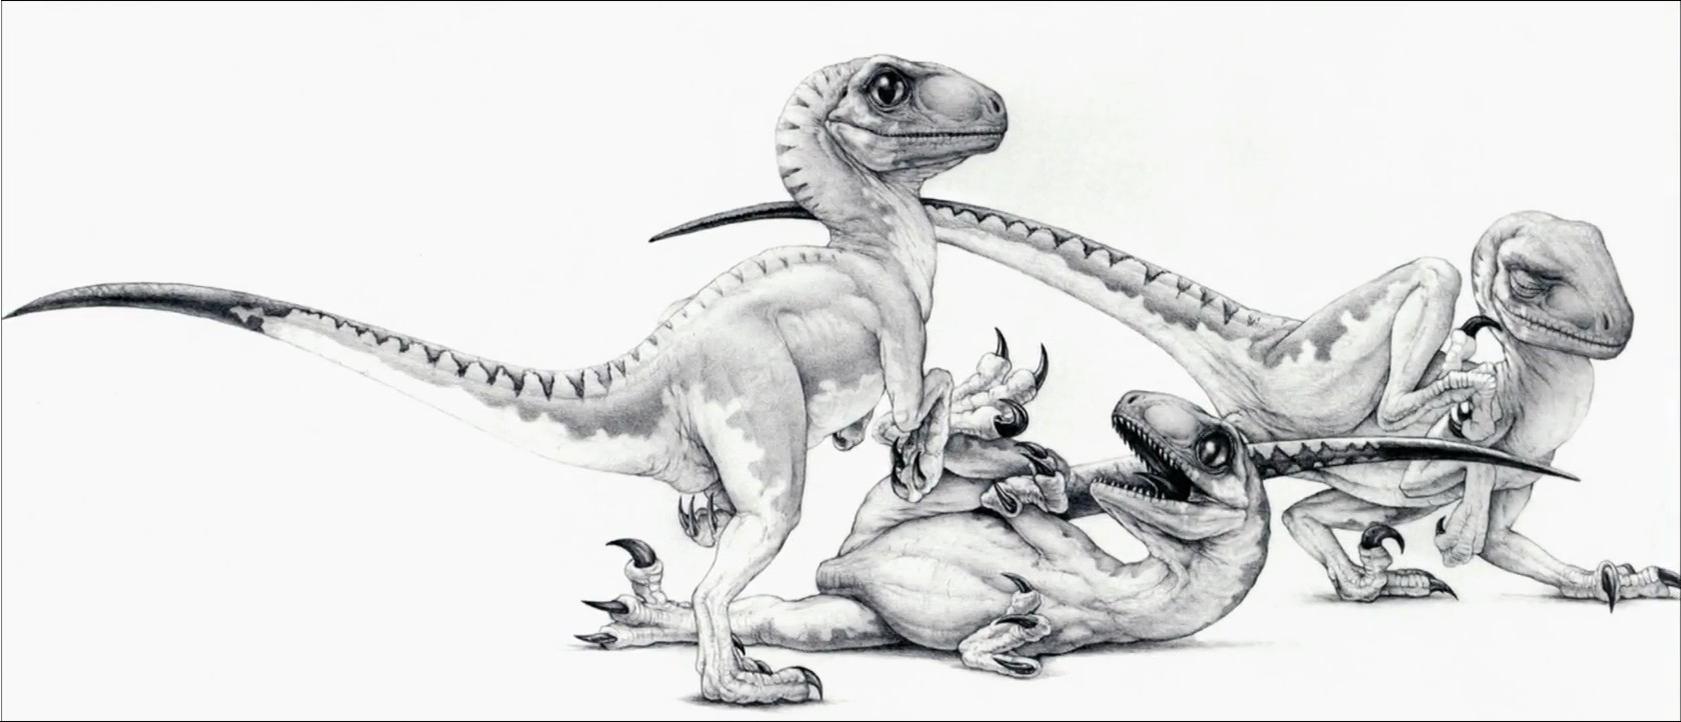 Jurassic Park baby Velociraptors concept drawing   Raptor ...